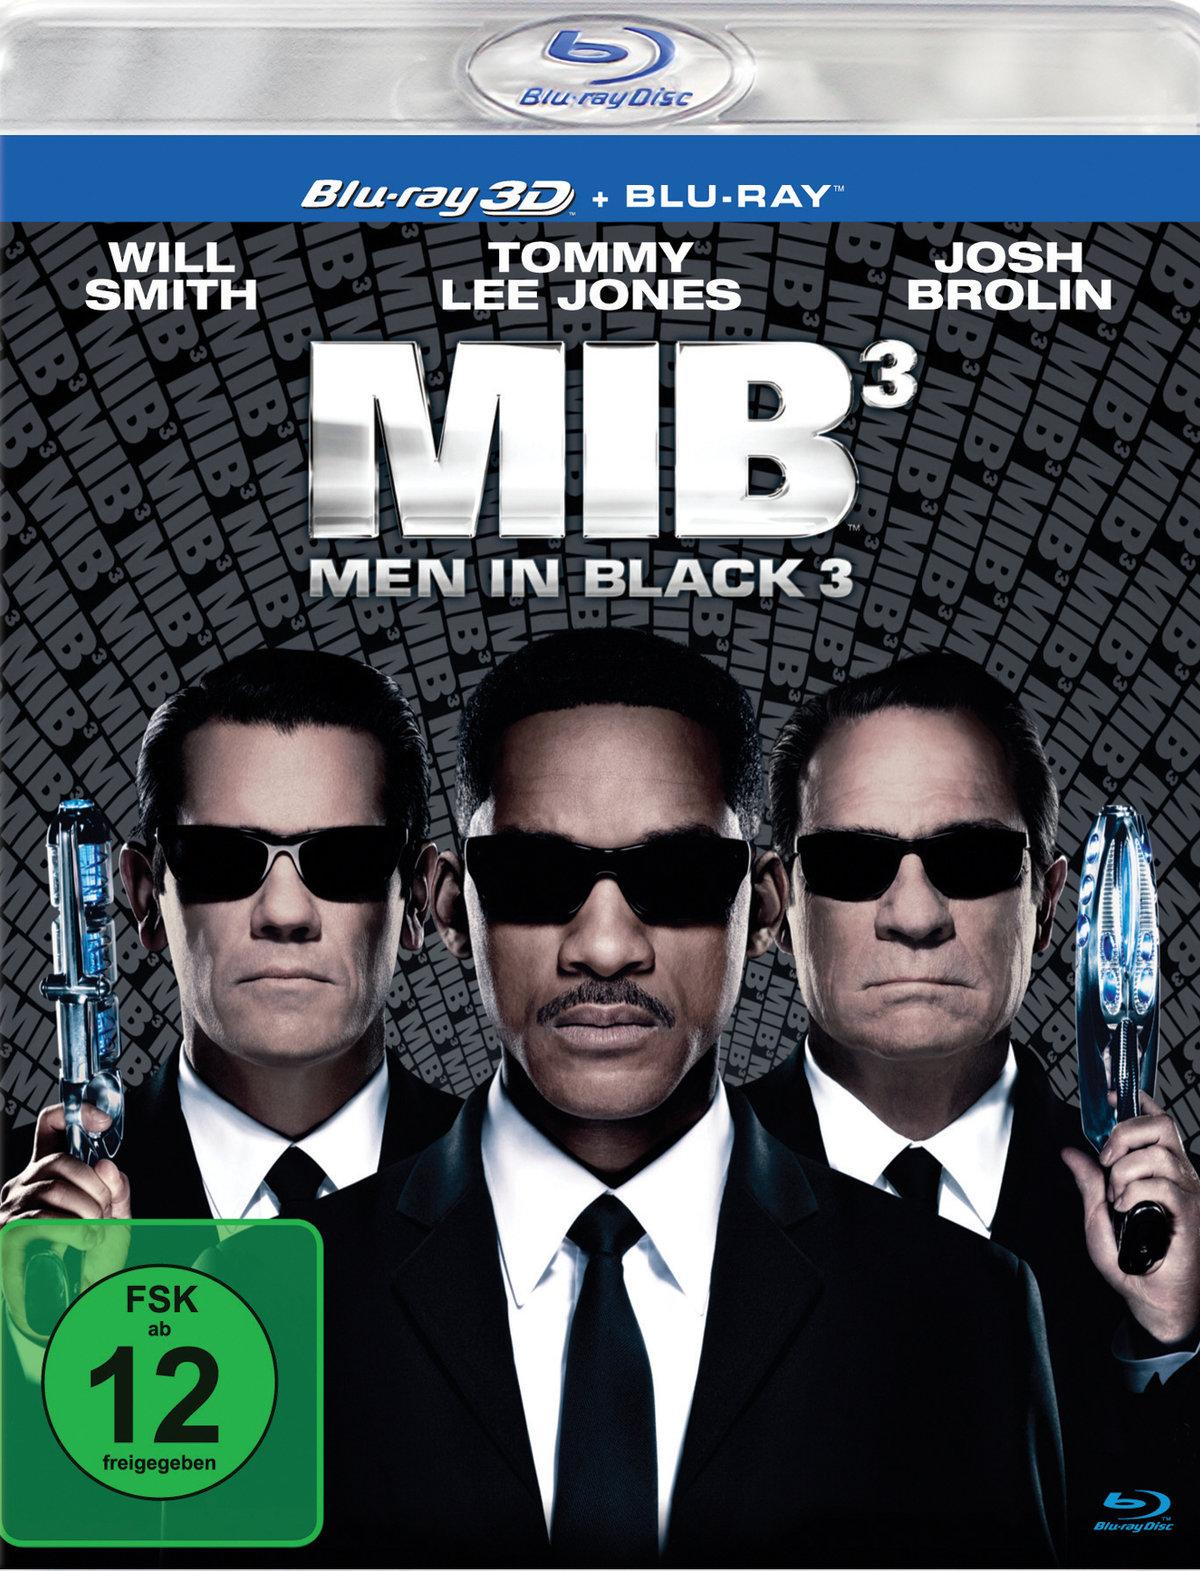 Men in Black 3 3D (2012) - (Blu-ray 3D (+2D))